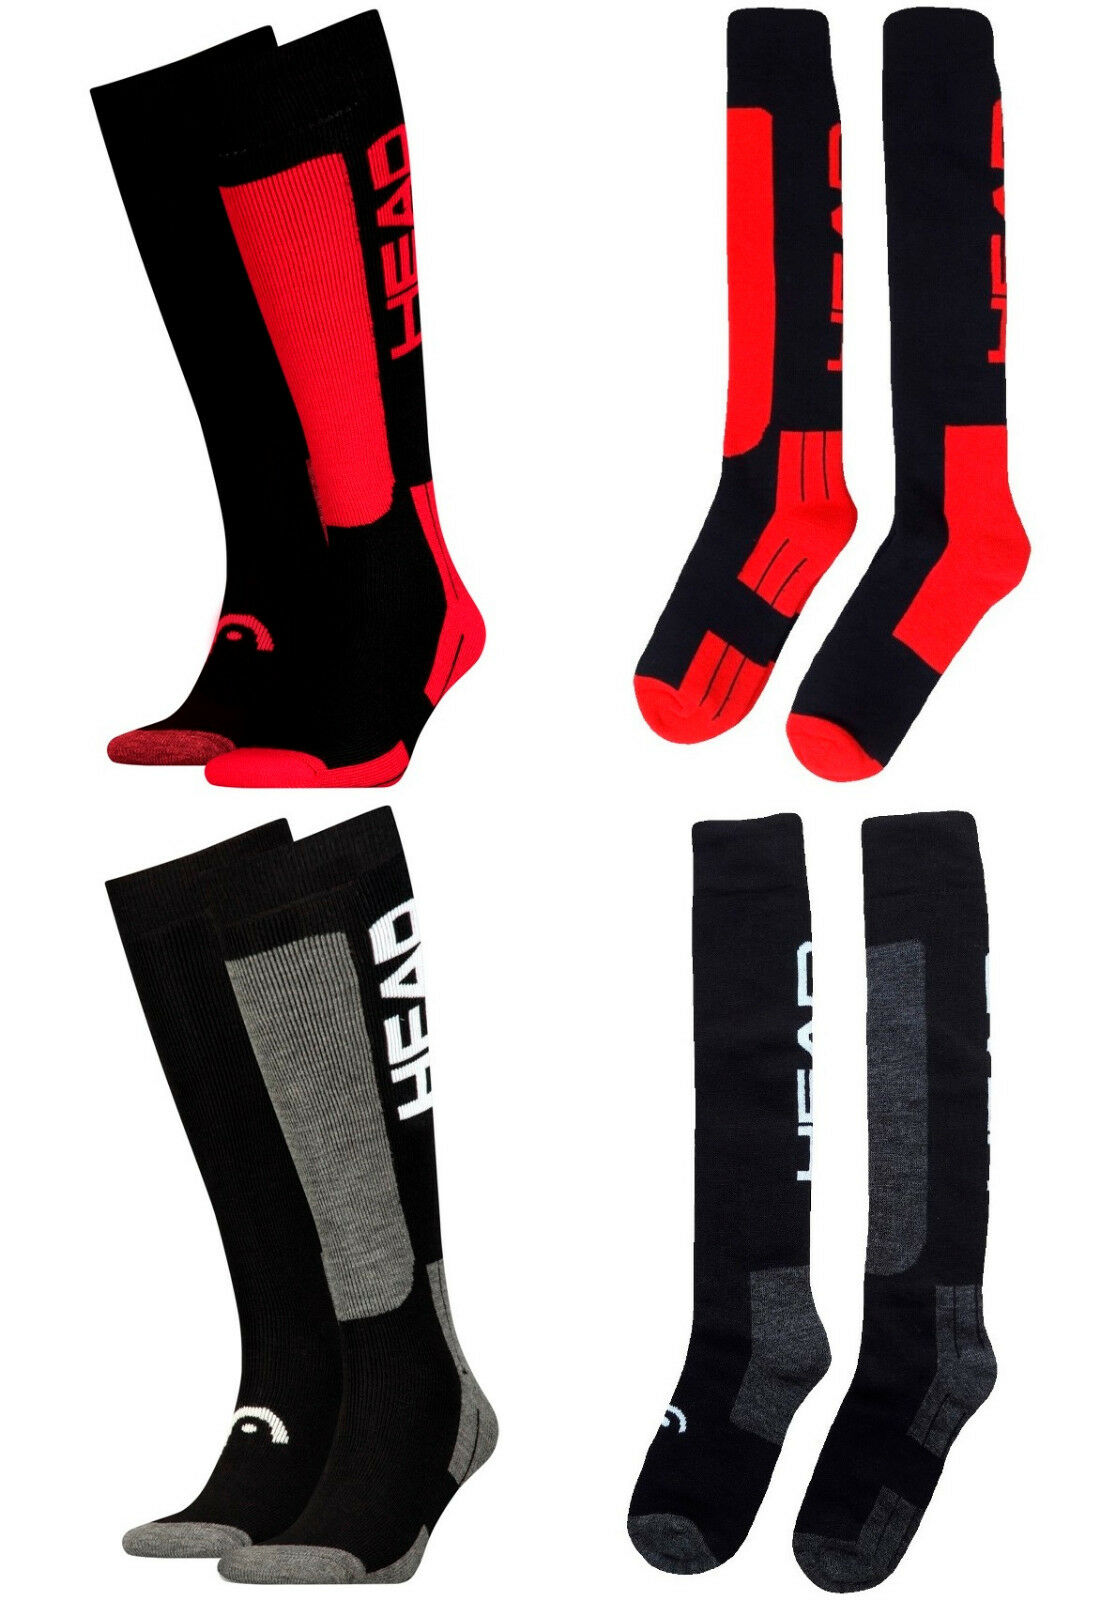 2 Paar HEAD CLASSIC Skisocken Thermo Kniestrümpfe Ski Snowboard Socken knielang